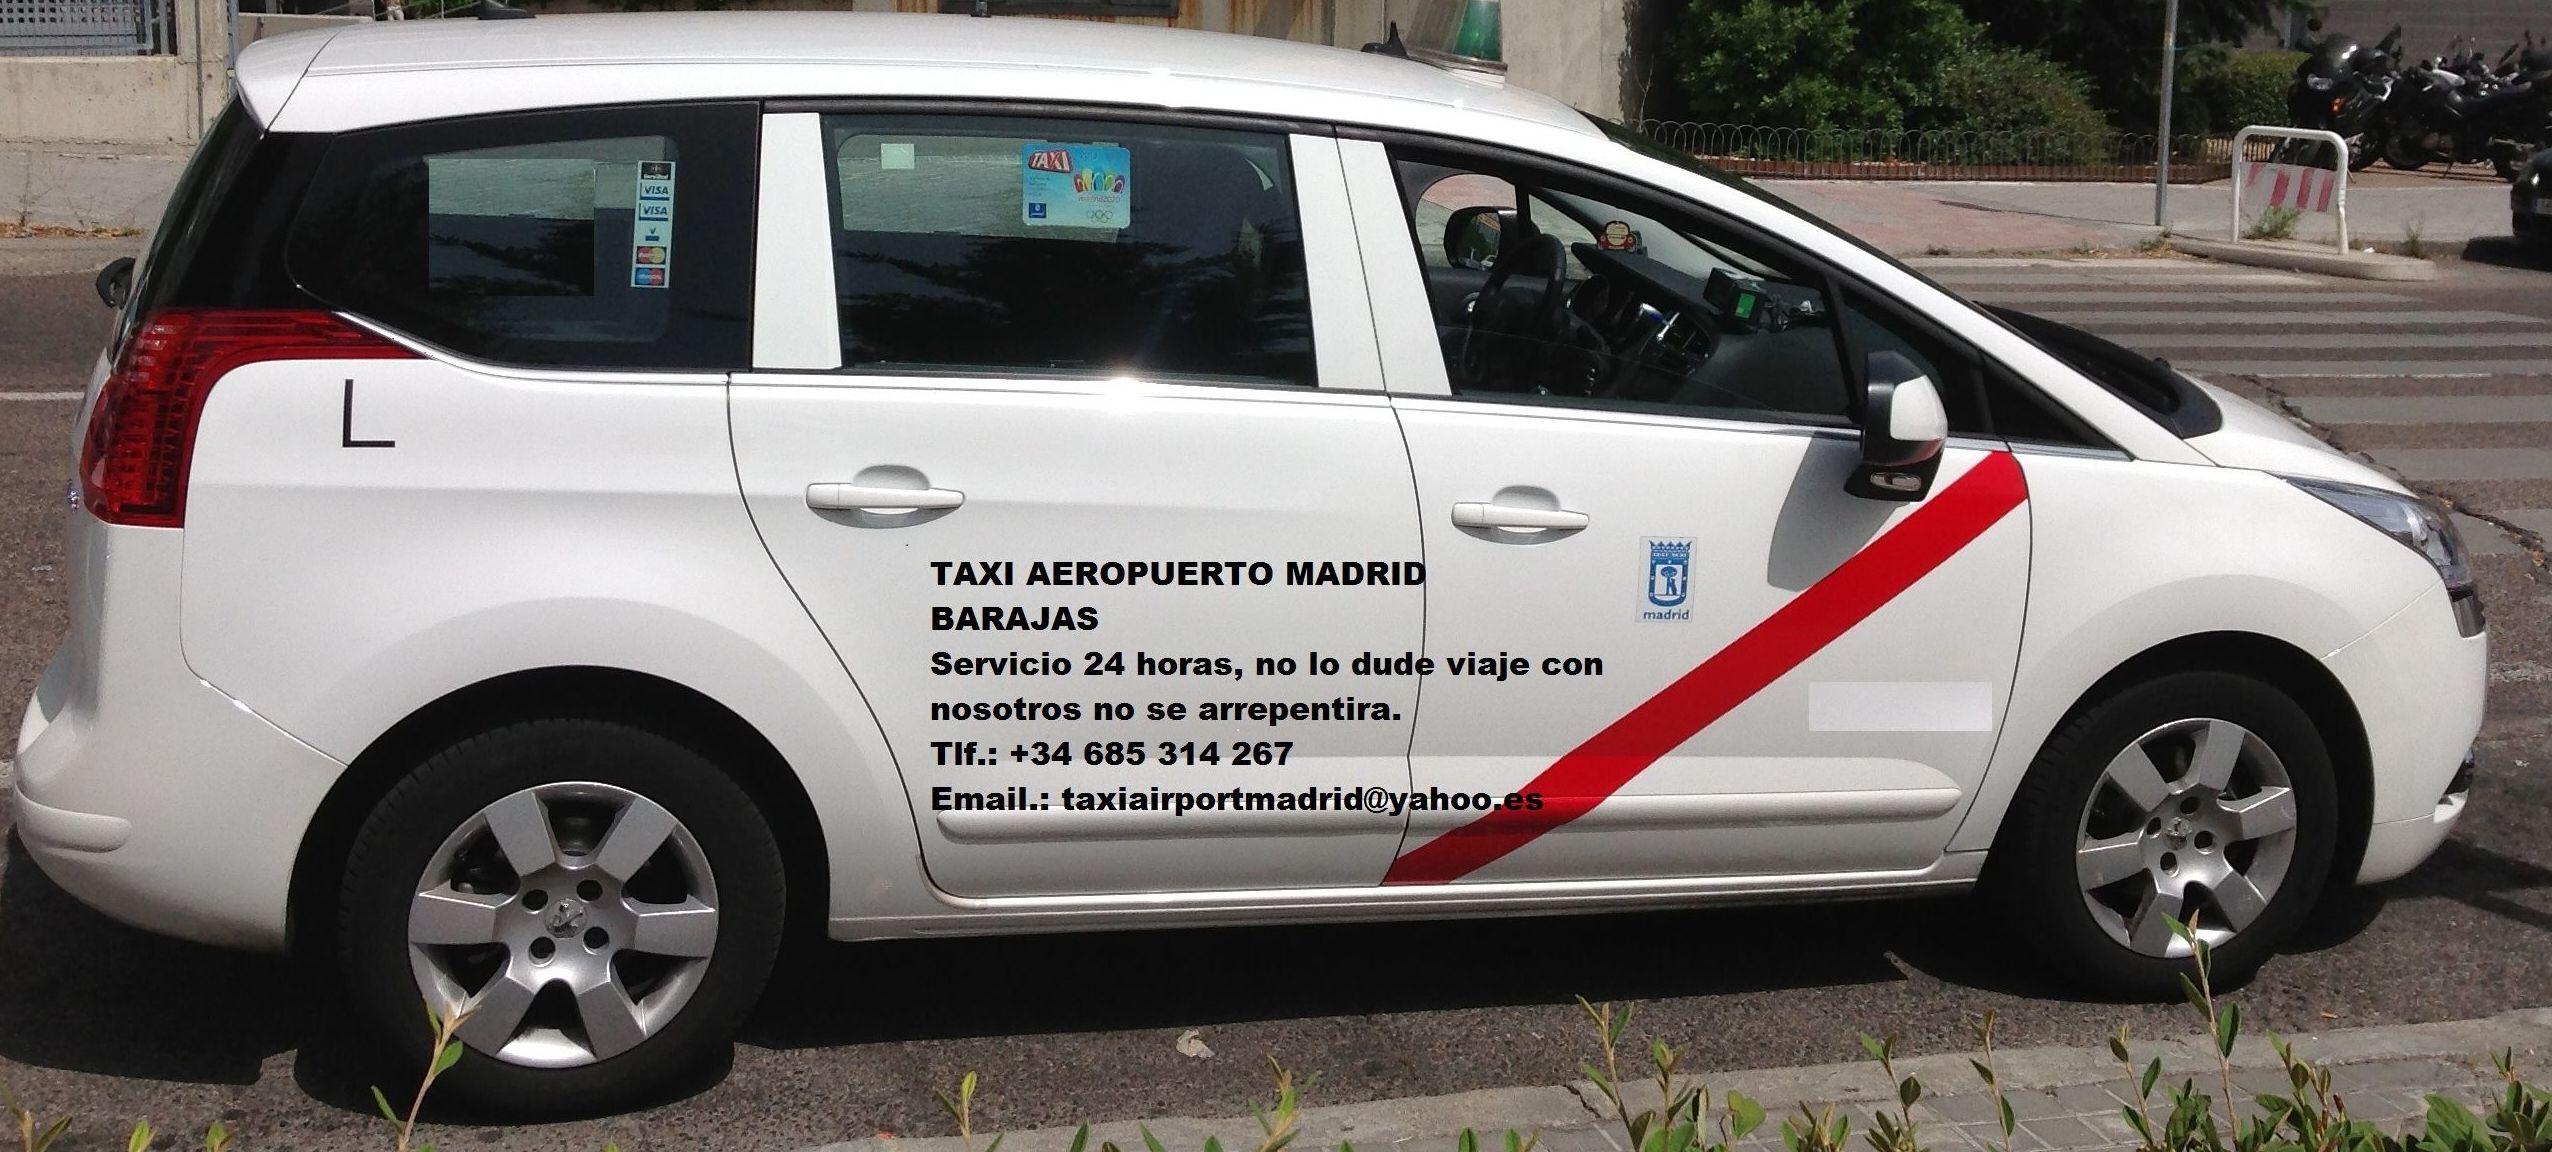 TAXI AEROPUERTO MADRID BARAJAS